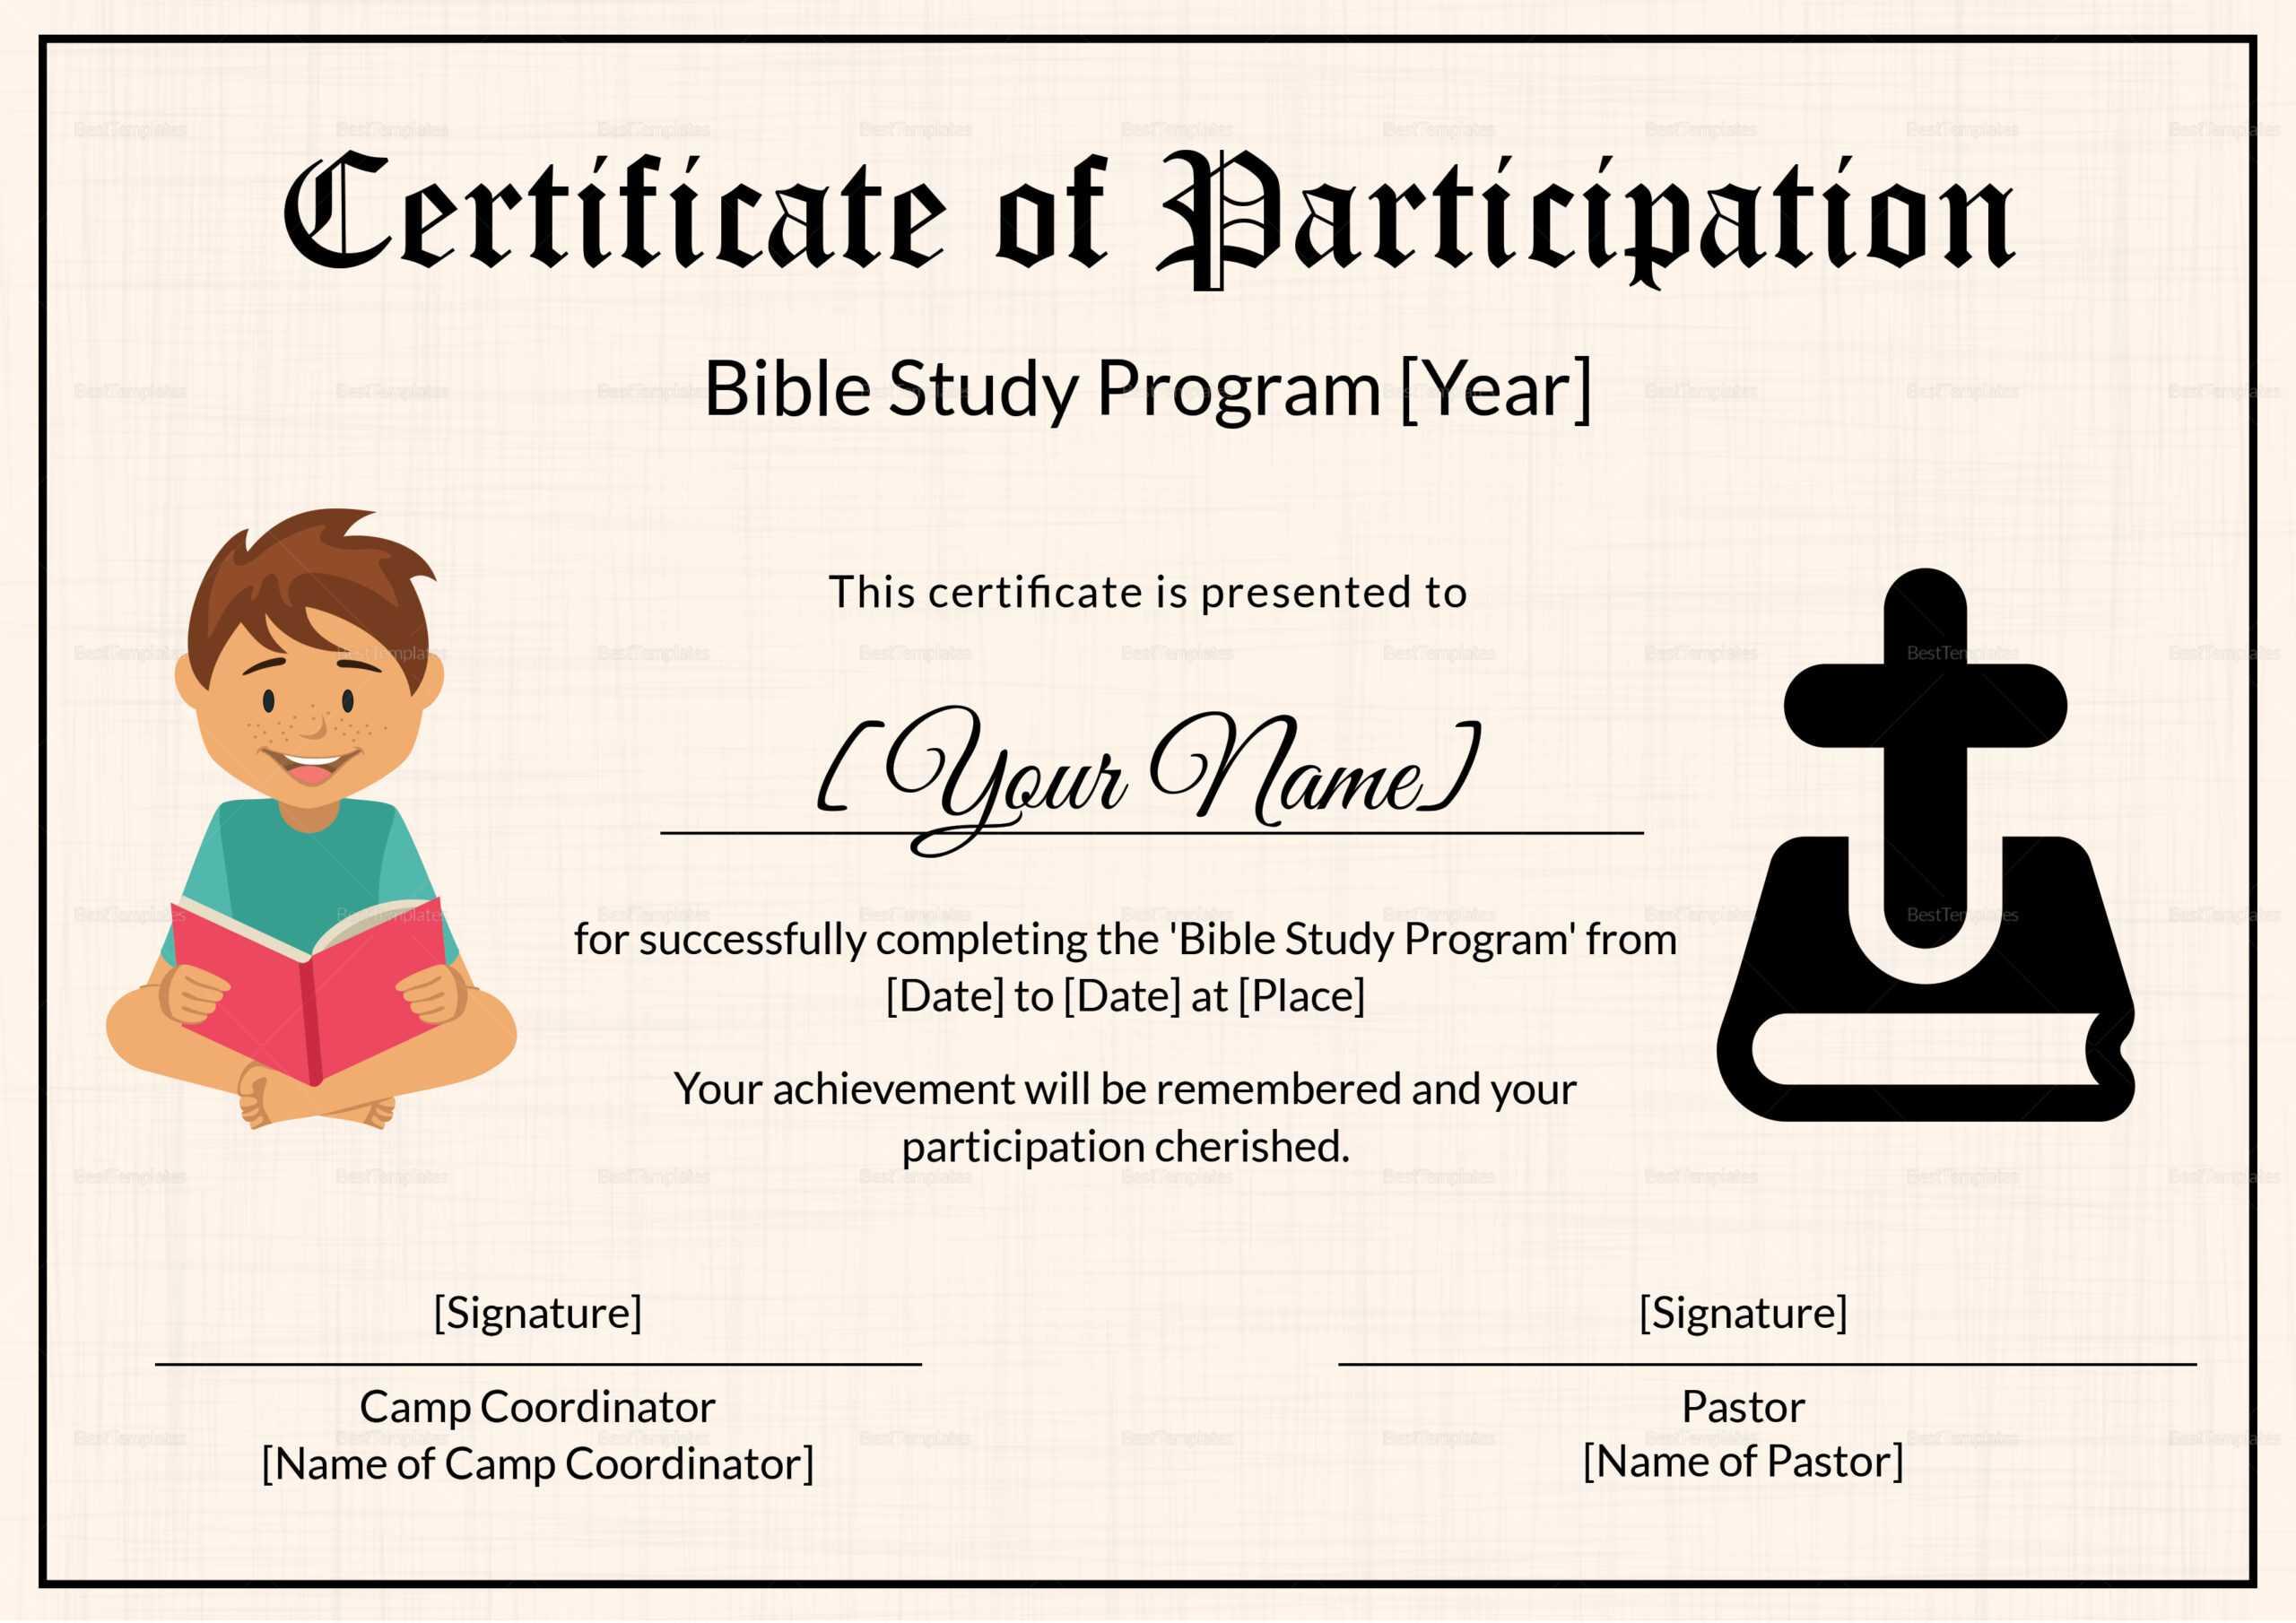 Bible Prophecy Program Certificate For Kids Template Inside Christian Certificate Template